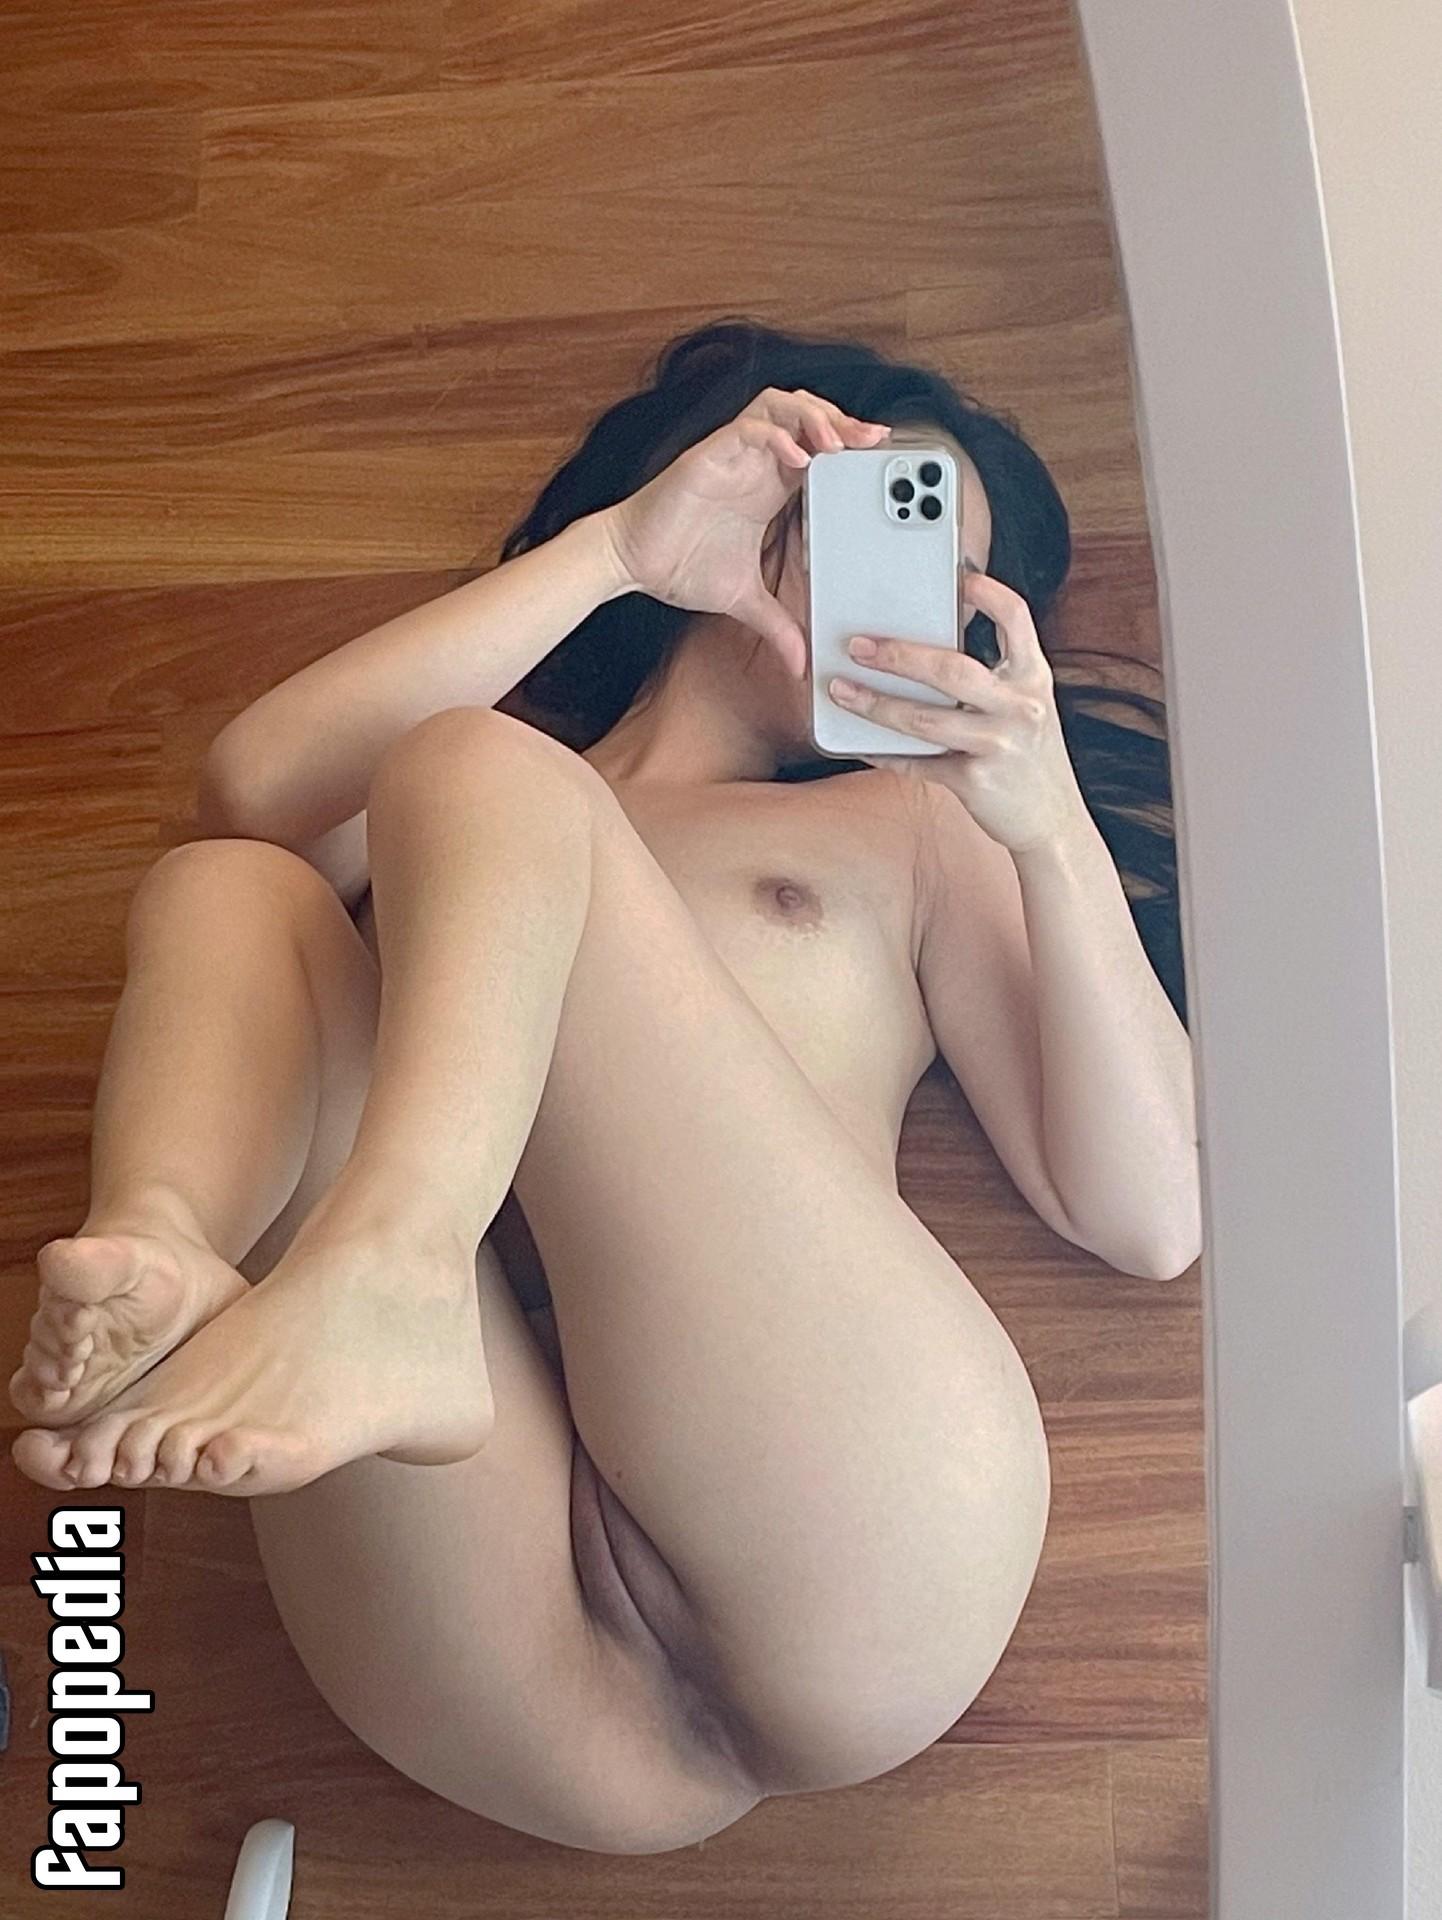 Xdaddysbabyx Nude Leaks